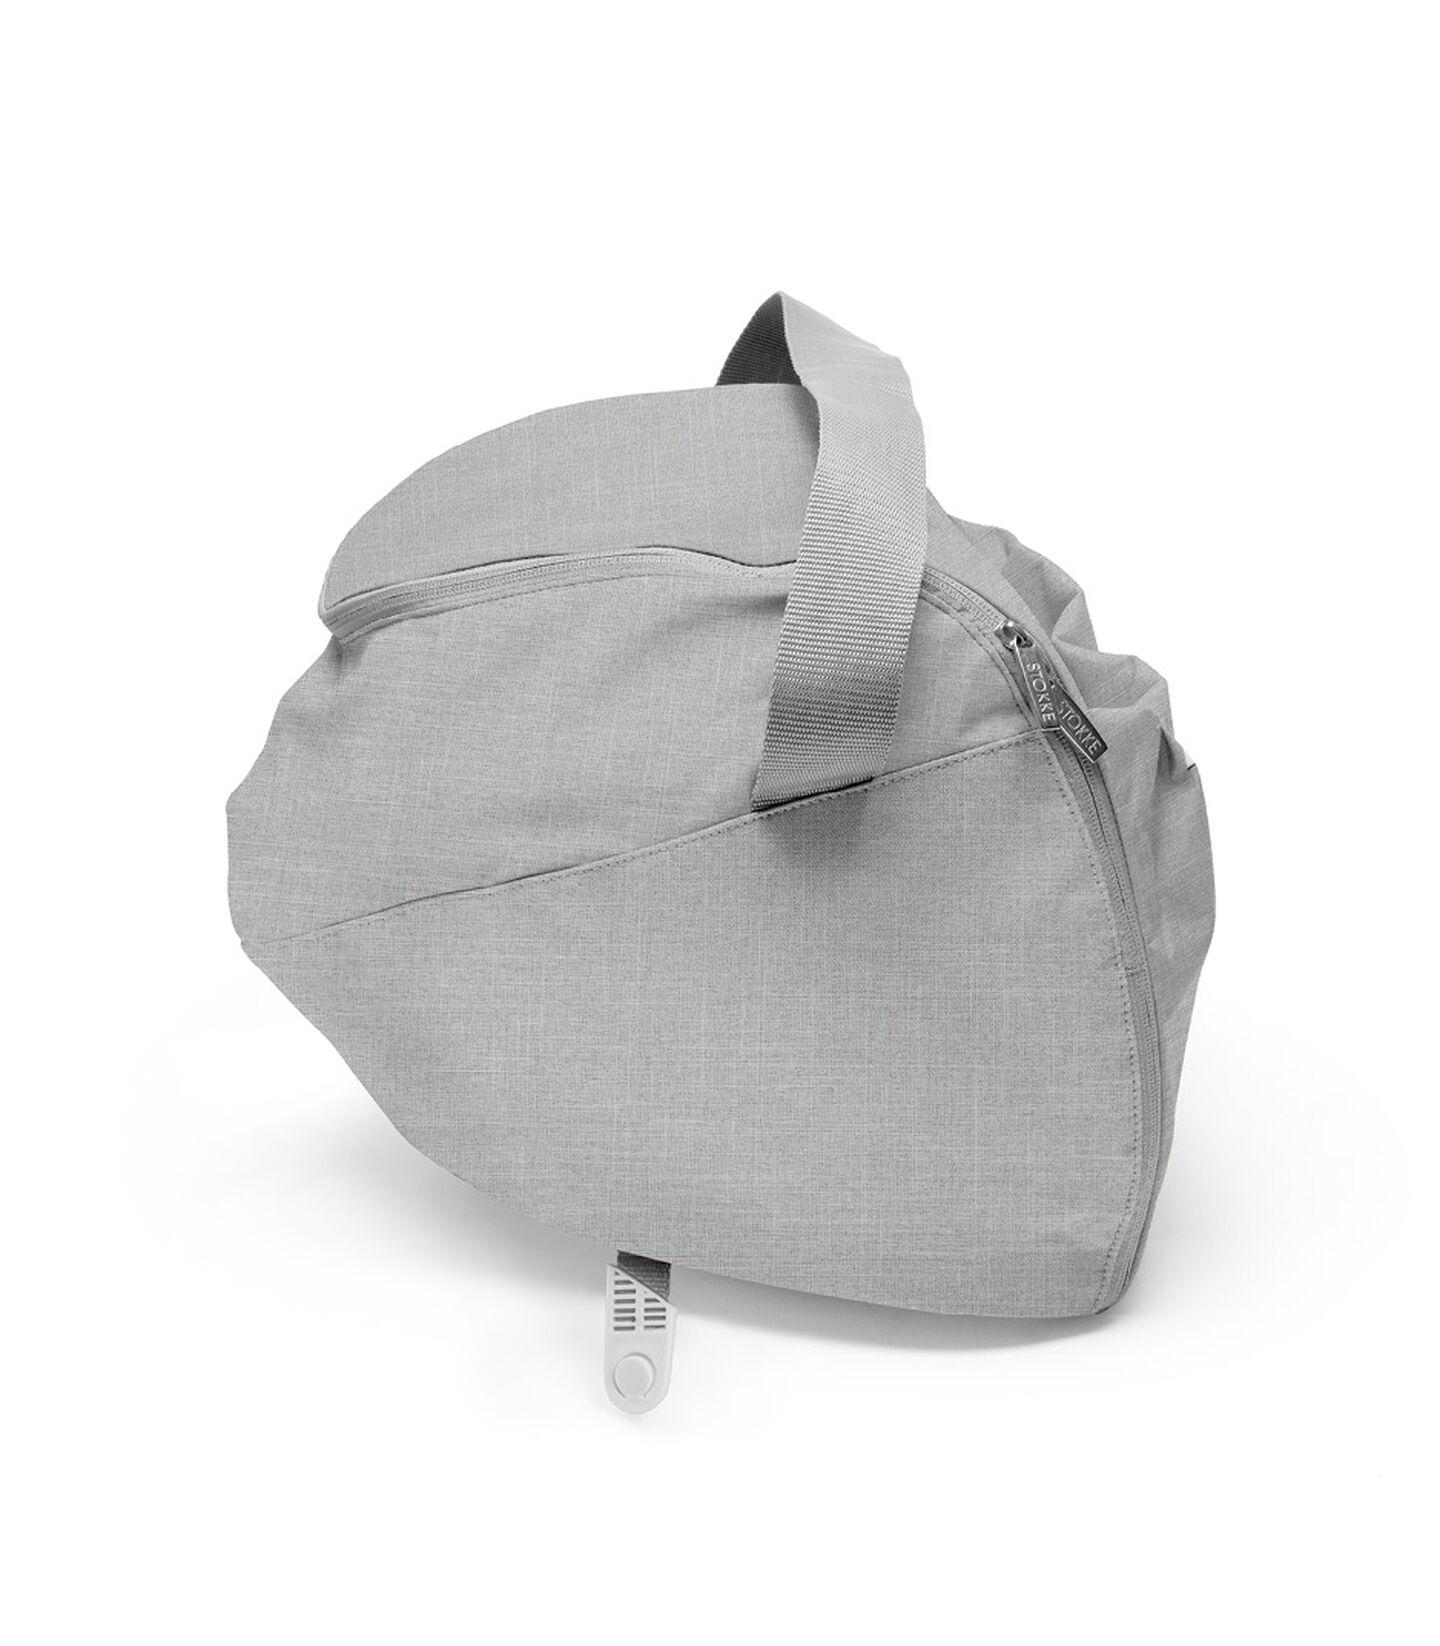 Stokke® Xplory® Shopping Bag Grey Mel, Grey Melange, mainview view 1